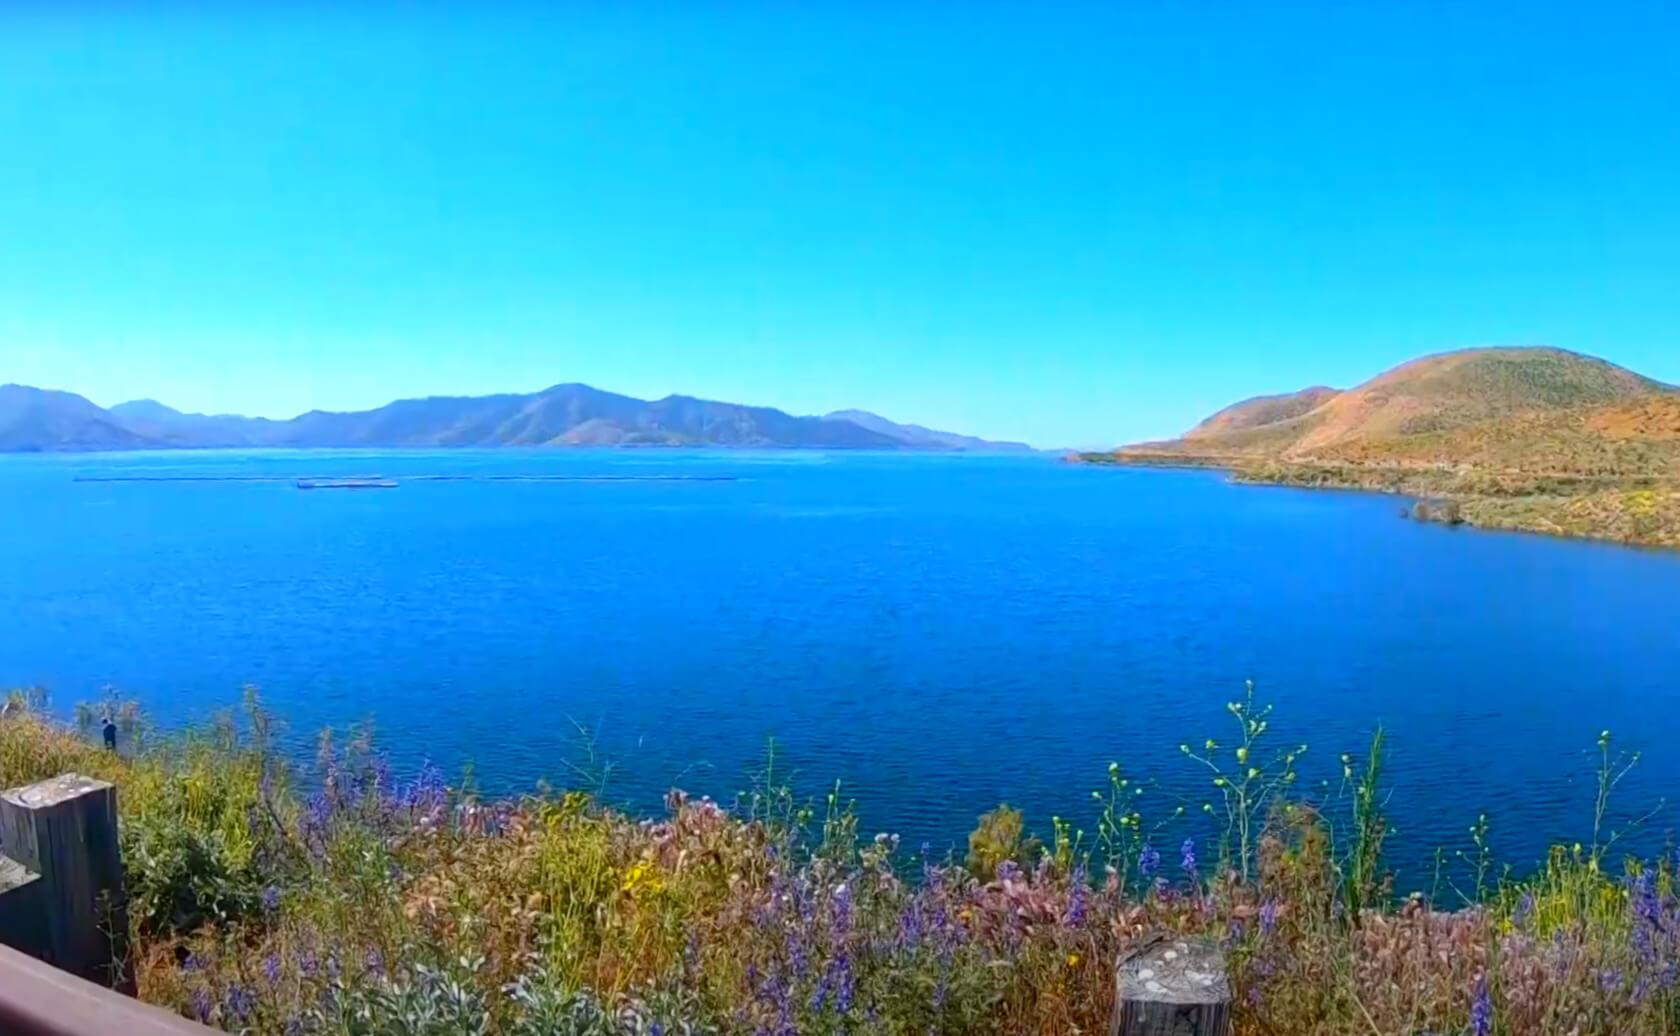 Diamond-Valley-Lake-Fishing-Guide-Report-Hemet-CA-11